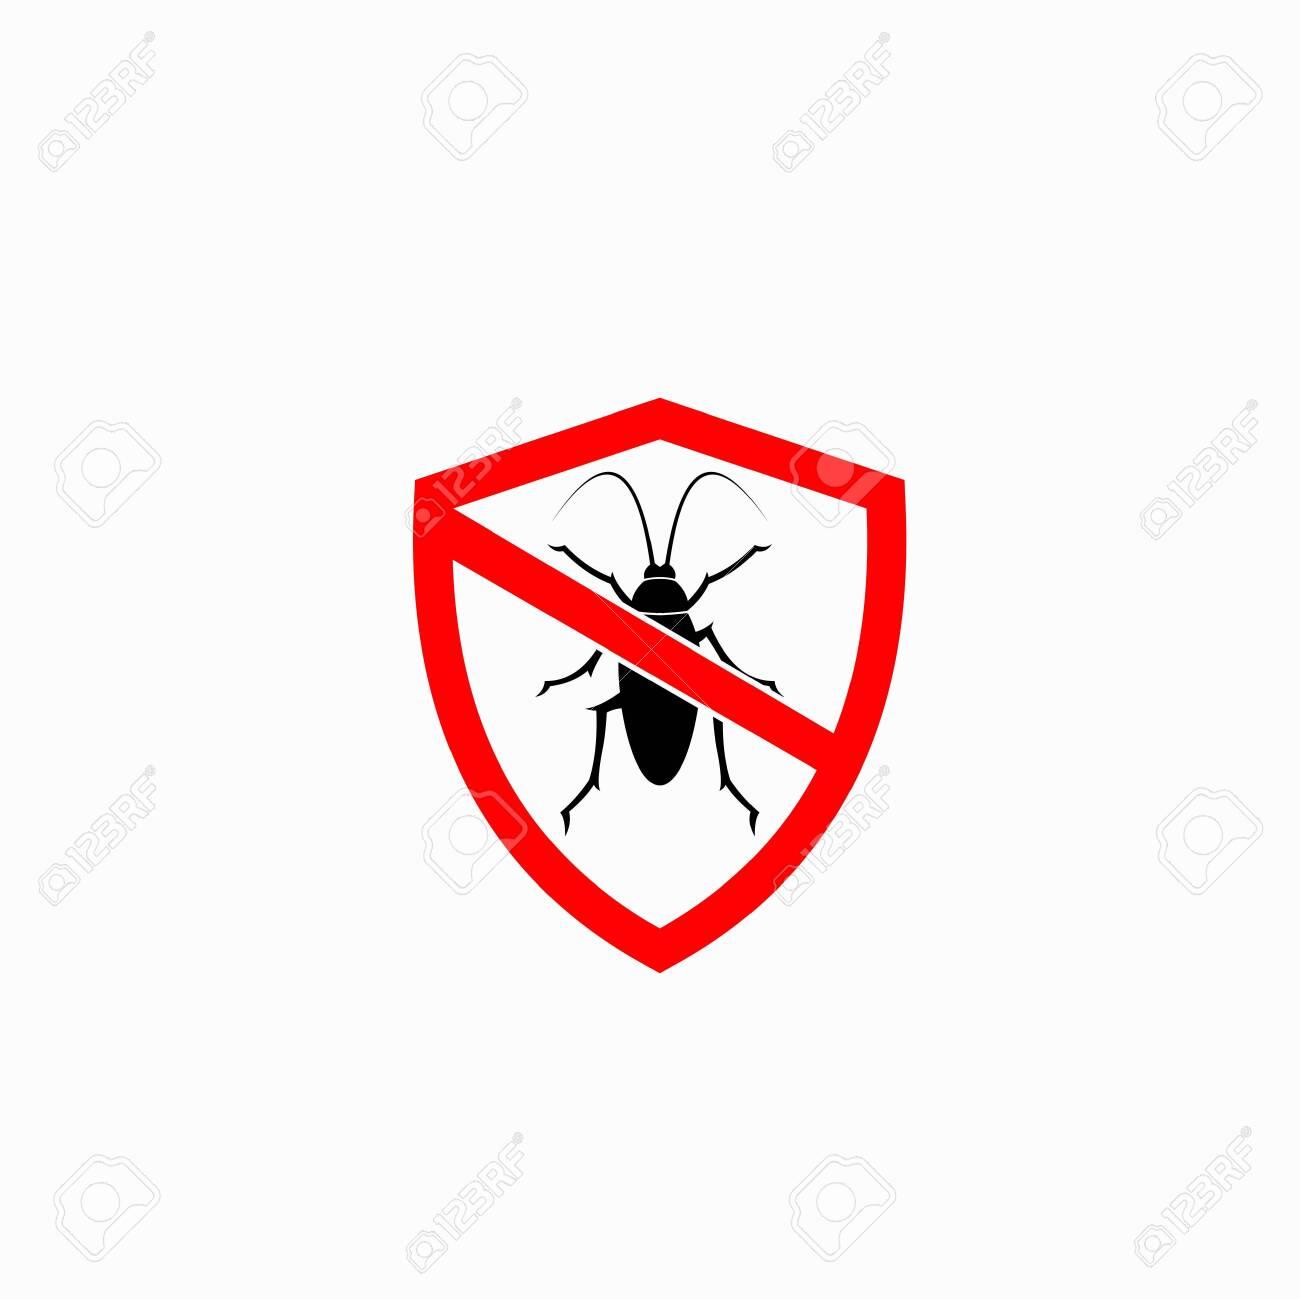 Cockroach logo accompanied shield concept - 143873841